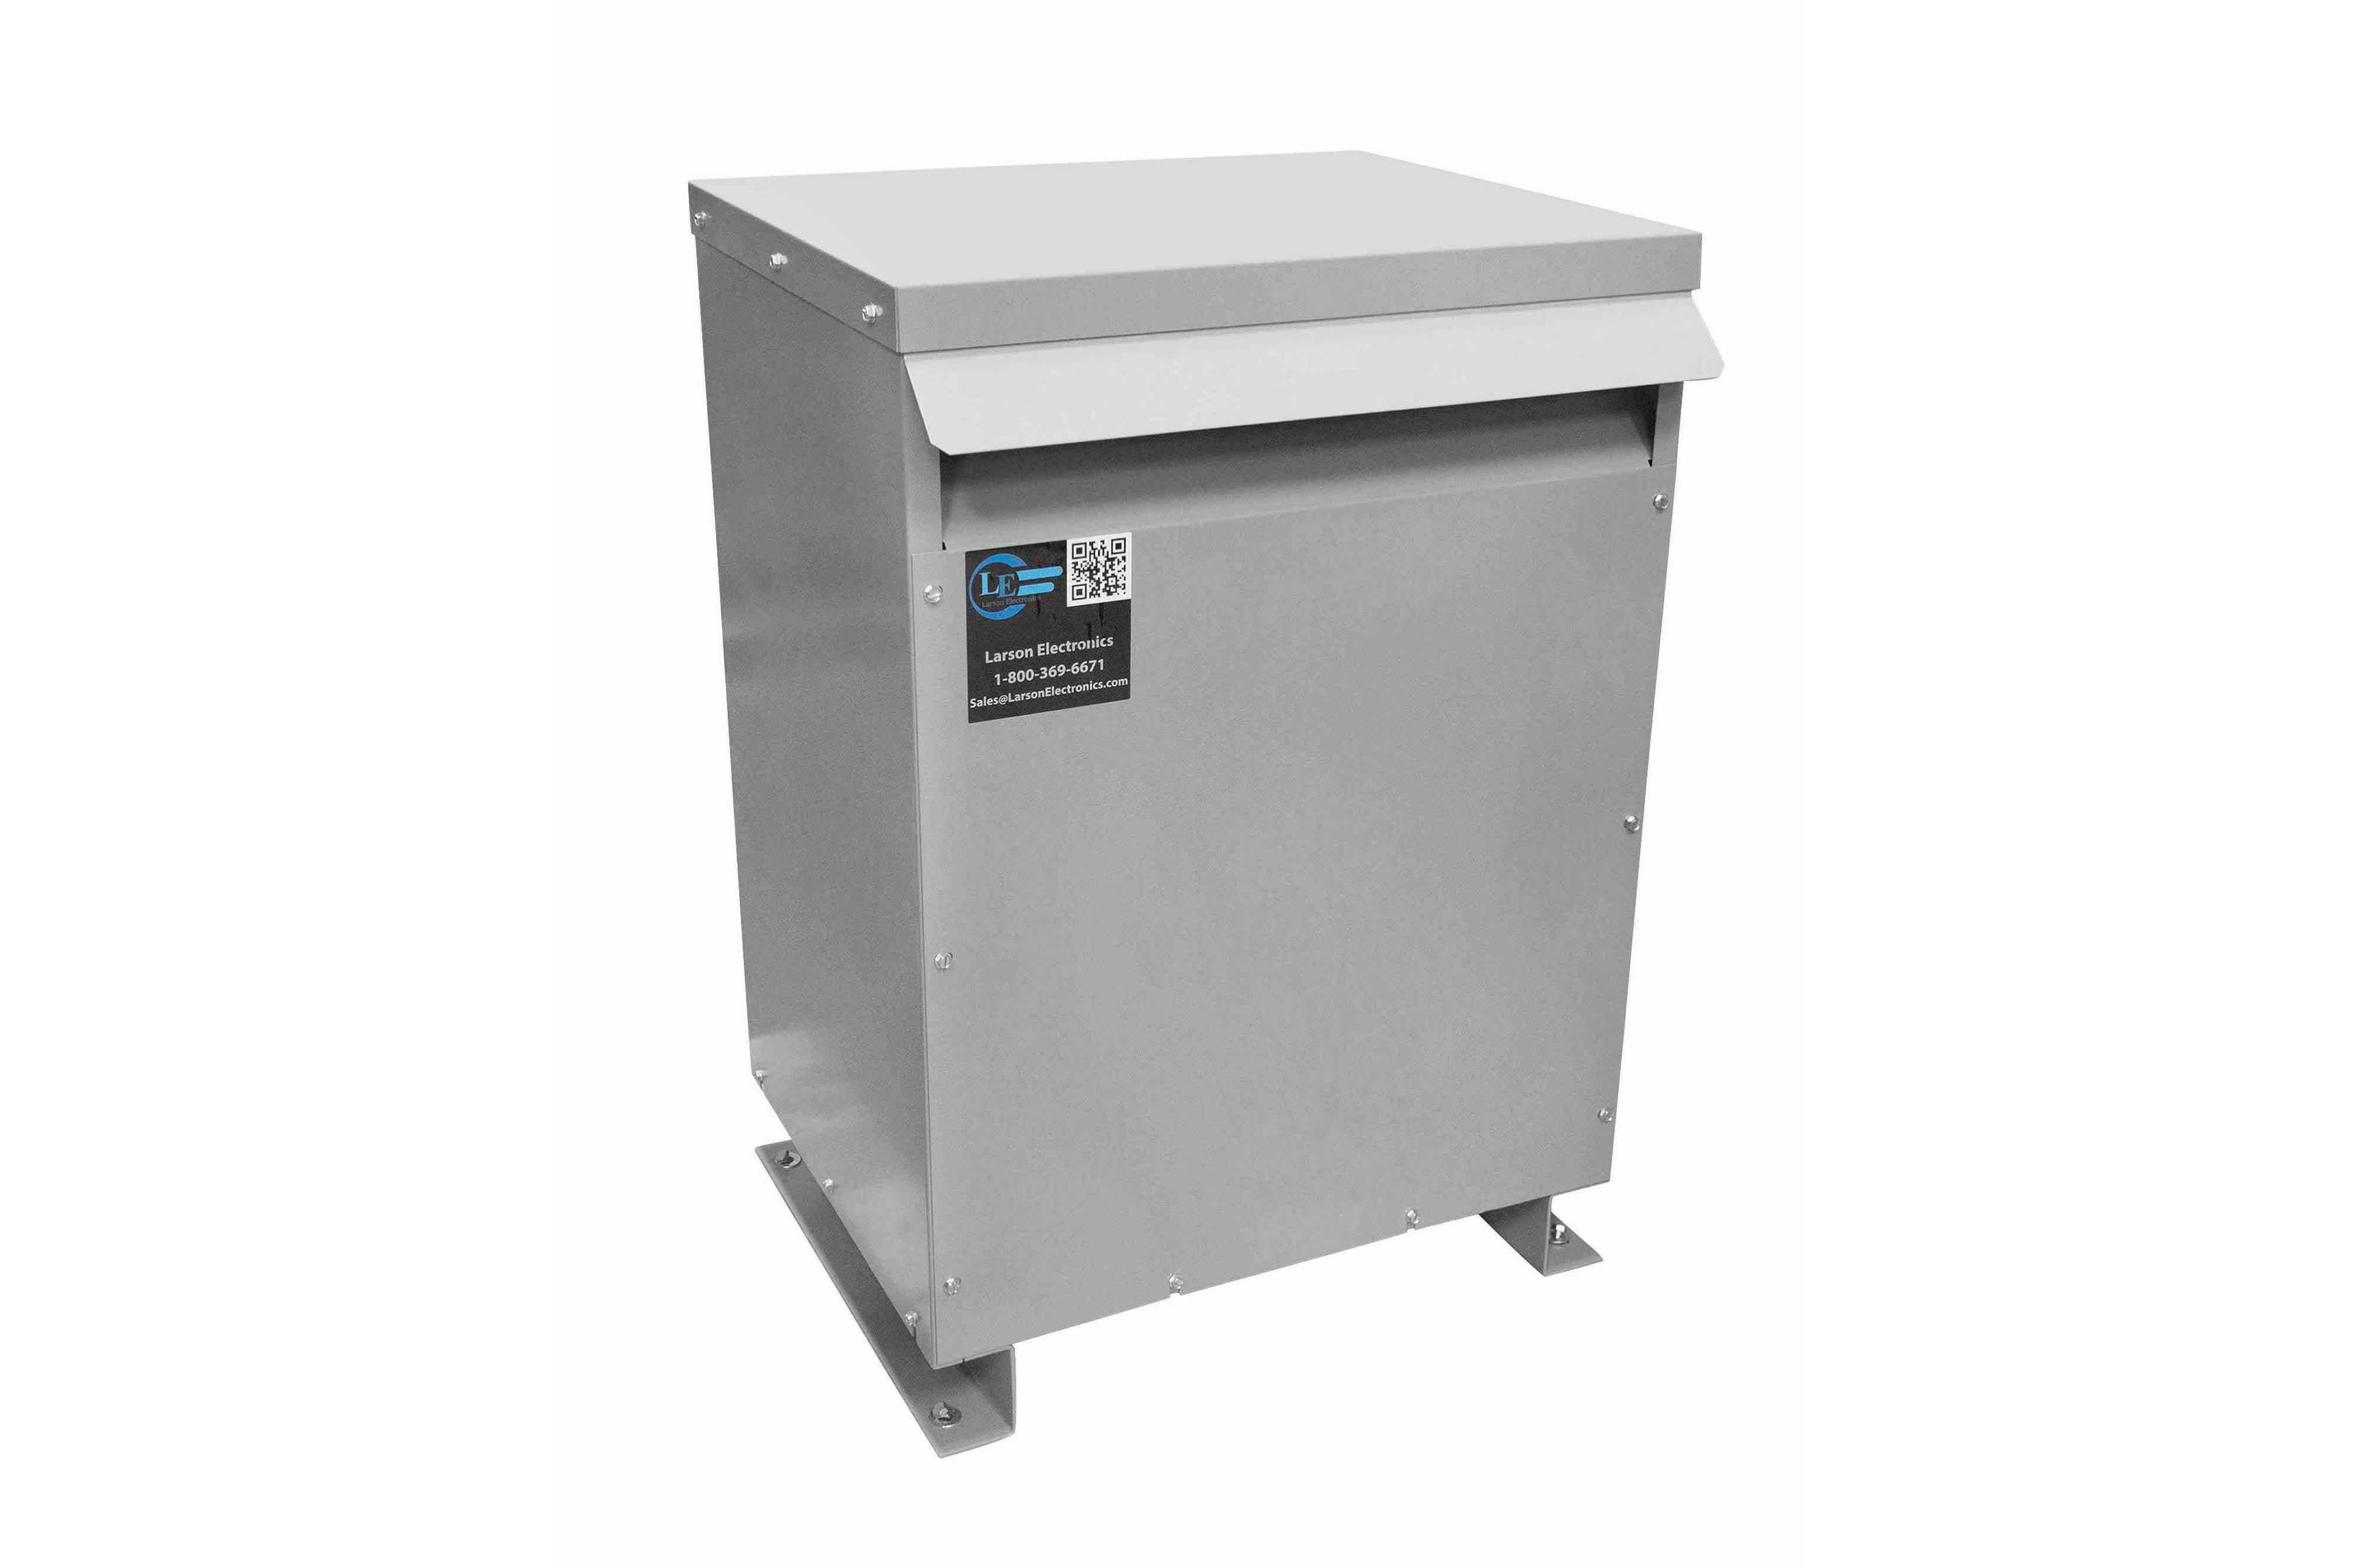 15 kVA 3PH Isolation Transformer, 600V Wye Primary, 400Y/231 Wye-N Secondary, N3R, Ventilated, 60 Hz